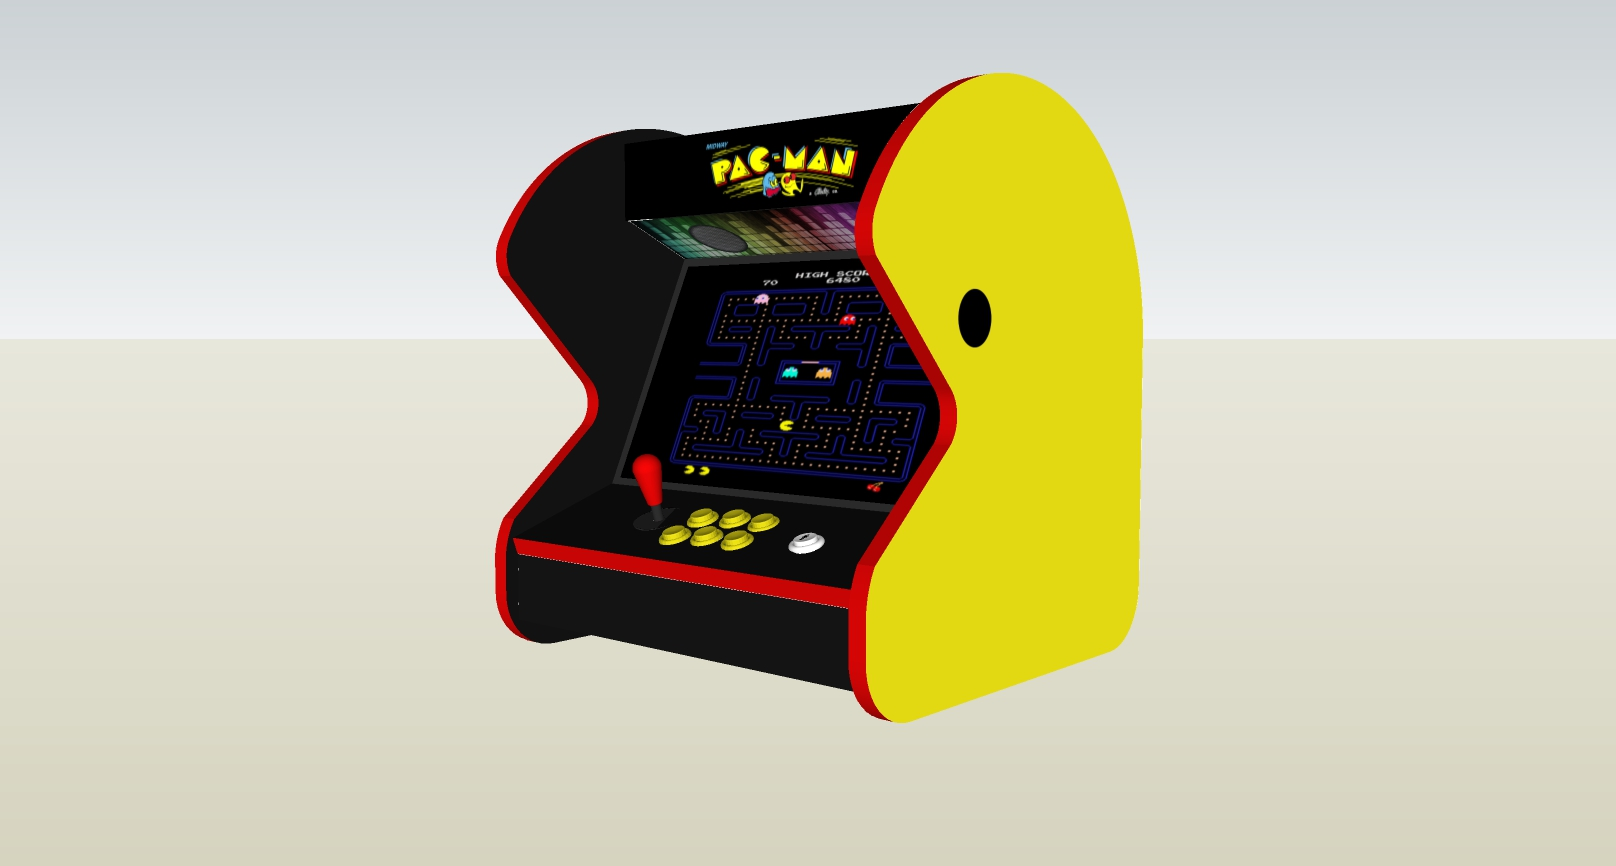 The PacMan Yellow Bartop Arcade Machine - right